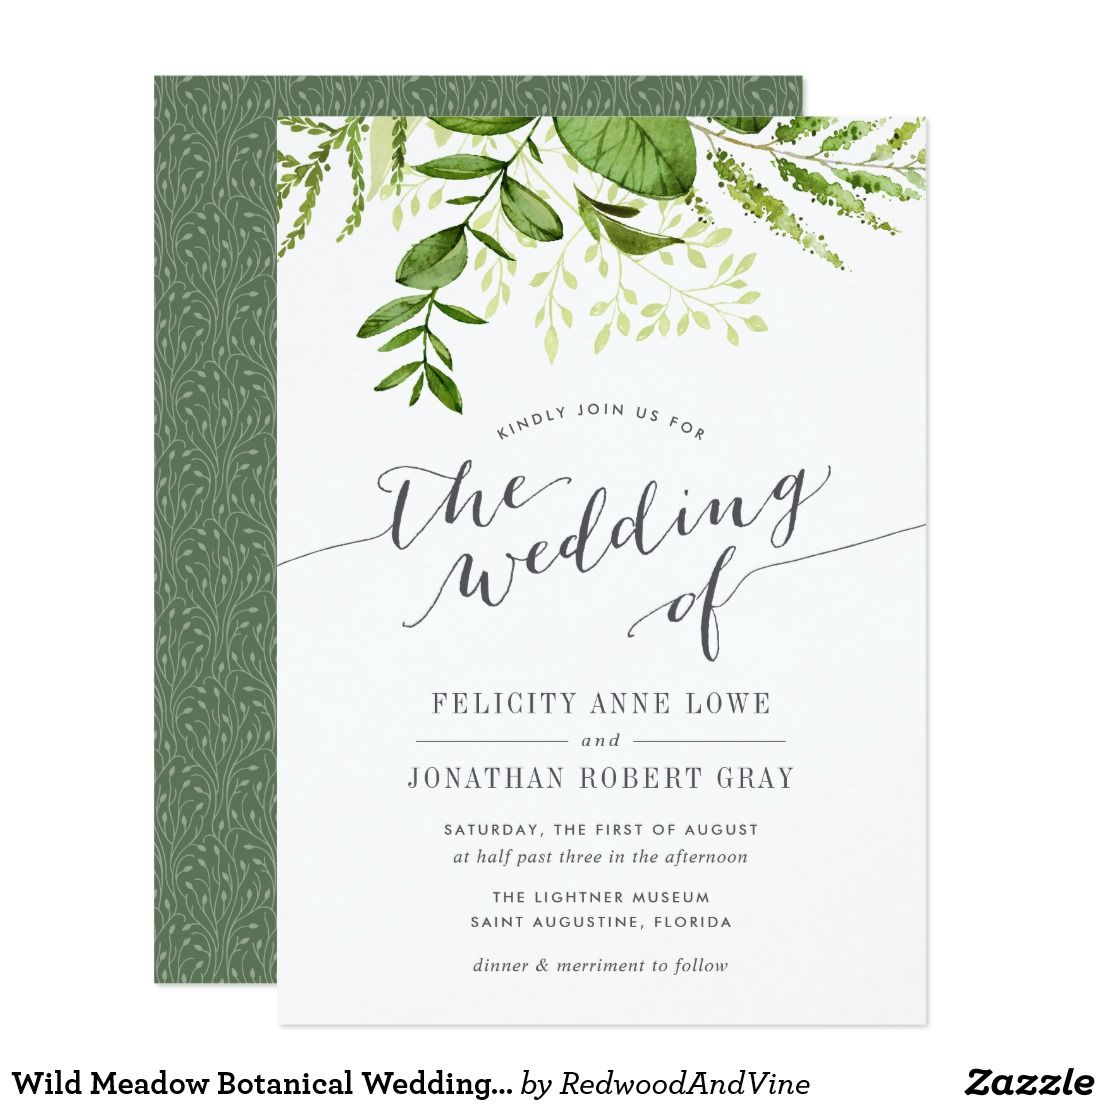 Wild Meadow Botanical Wedding Invitation | The-Elegant-Wedding ...